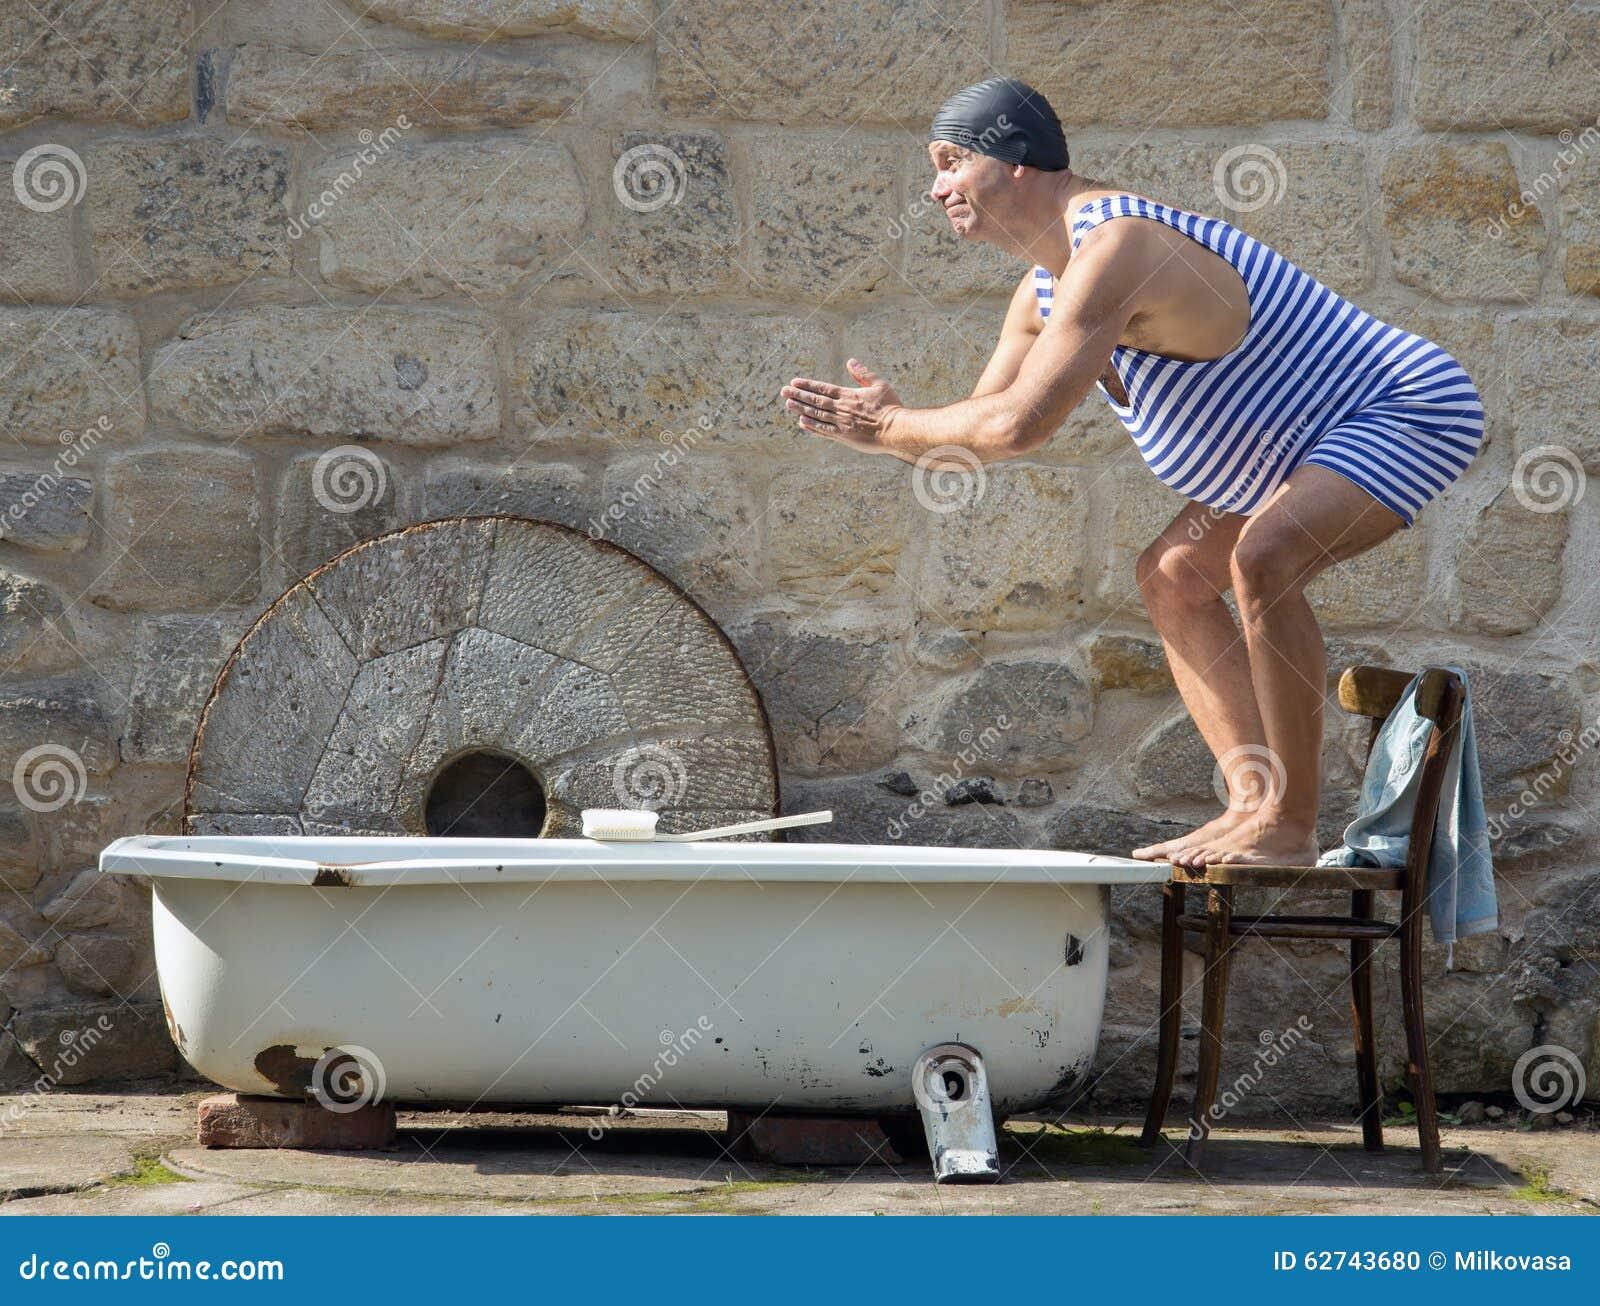 badewanne bilder lustig